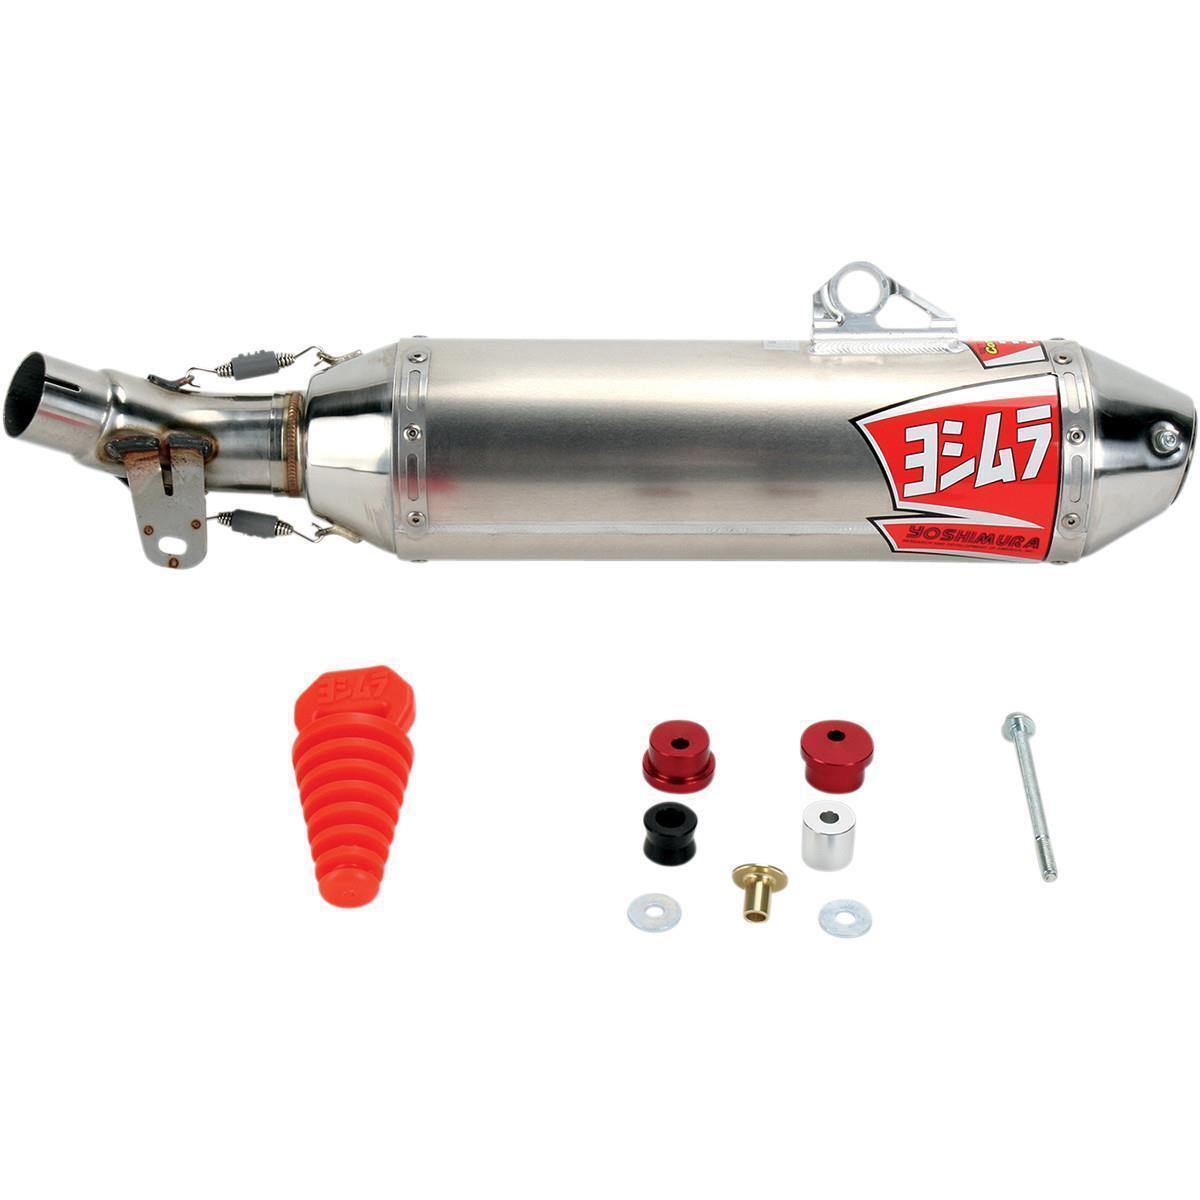 Lexx Slip On Silencer Exhaust TRX450R 2004-2005 muffler pipe trx450 trx 450 450r